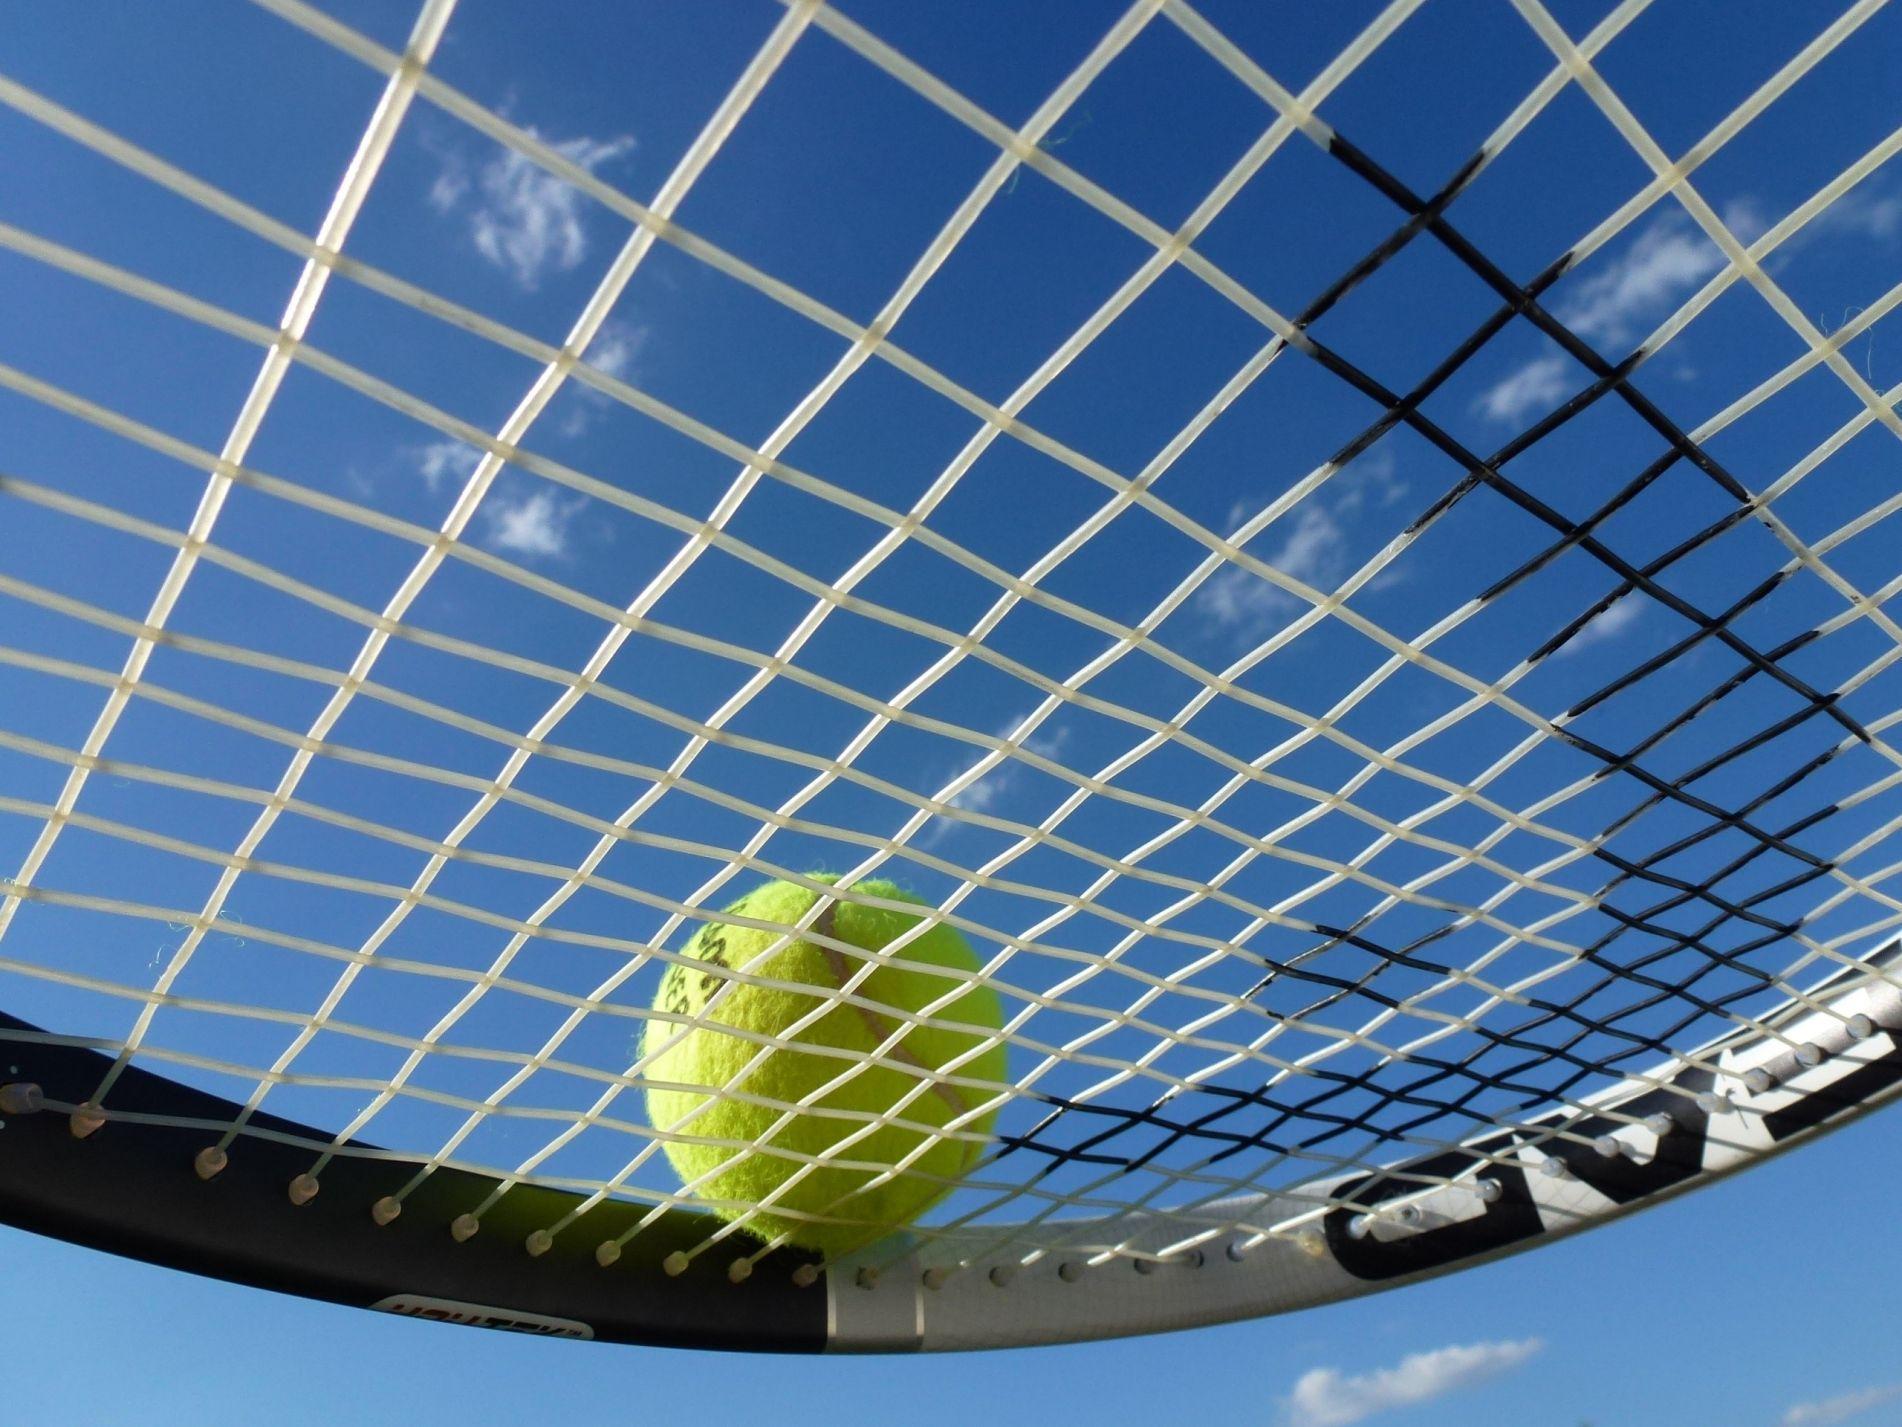 Festival de Mini Tênis tem data modificada